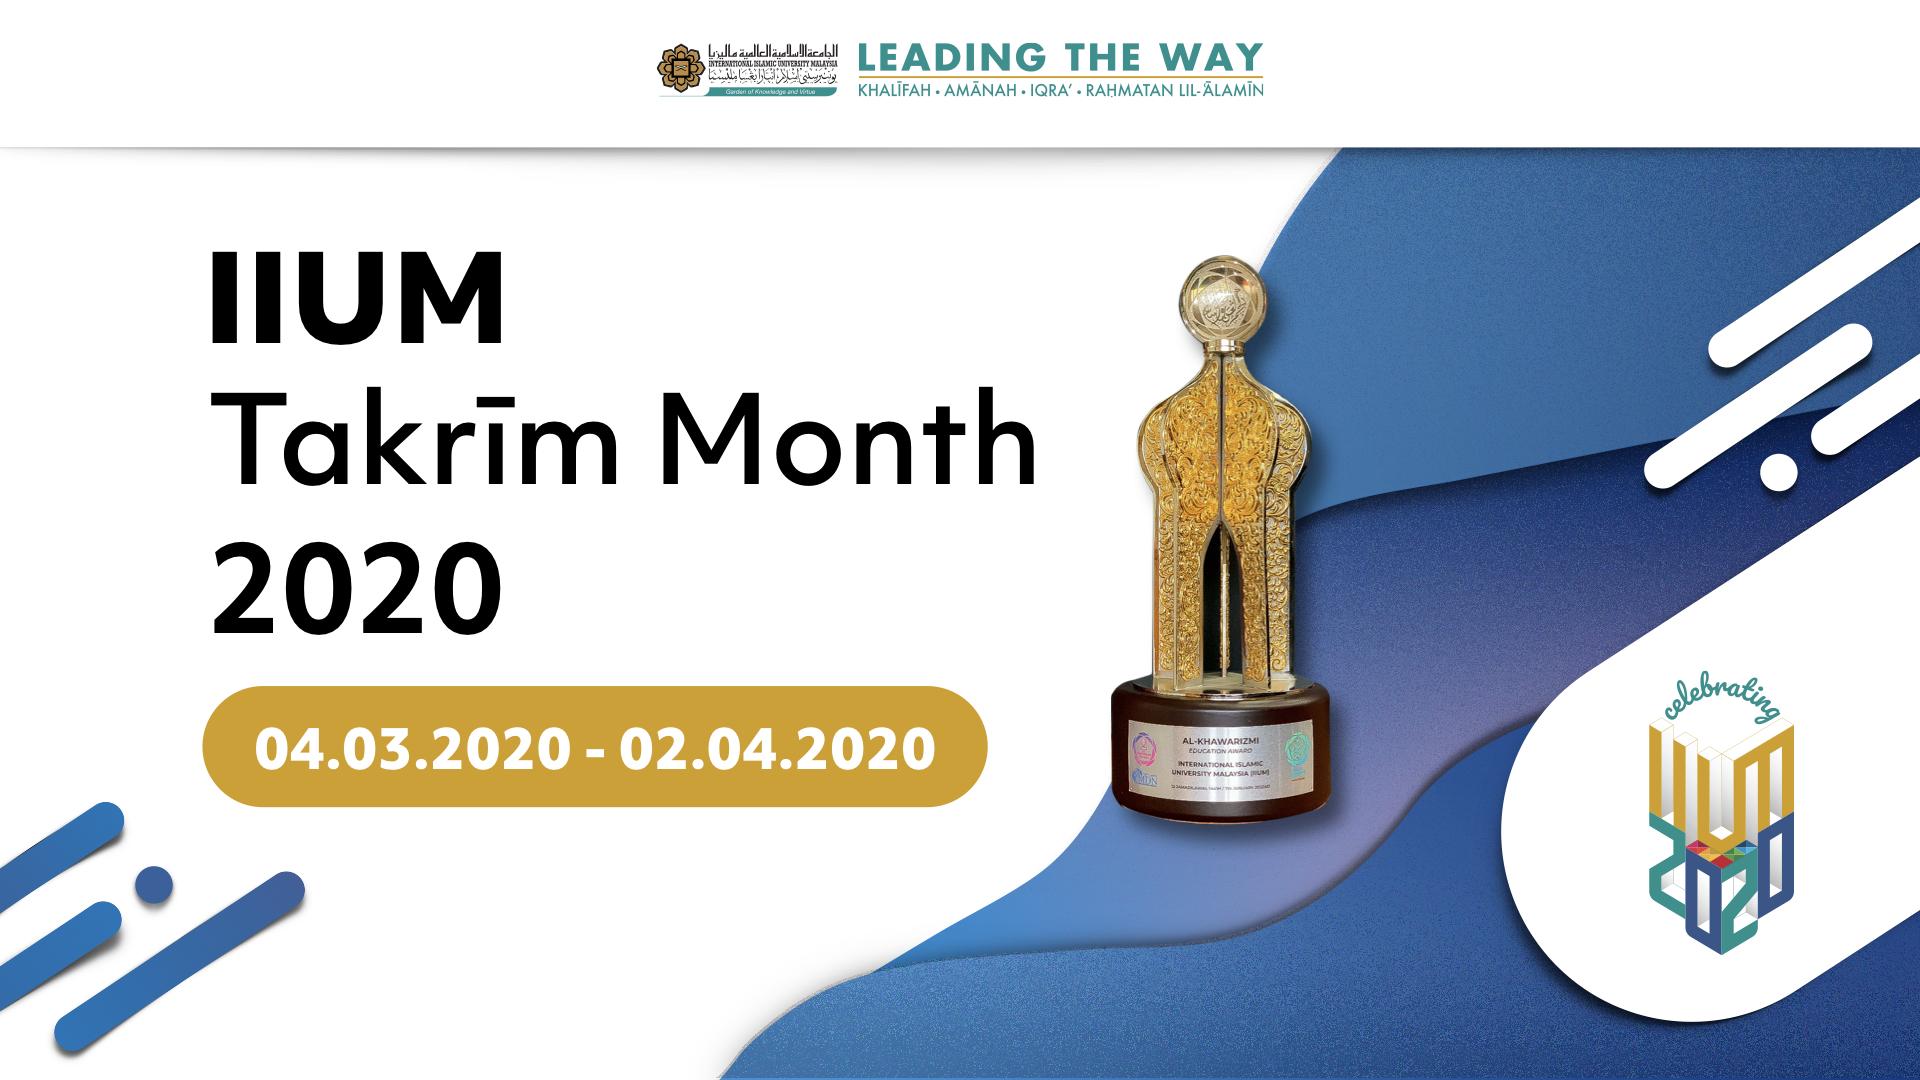 IIUM Takrim Month 2020